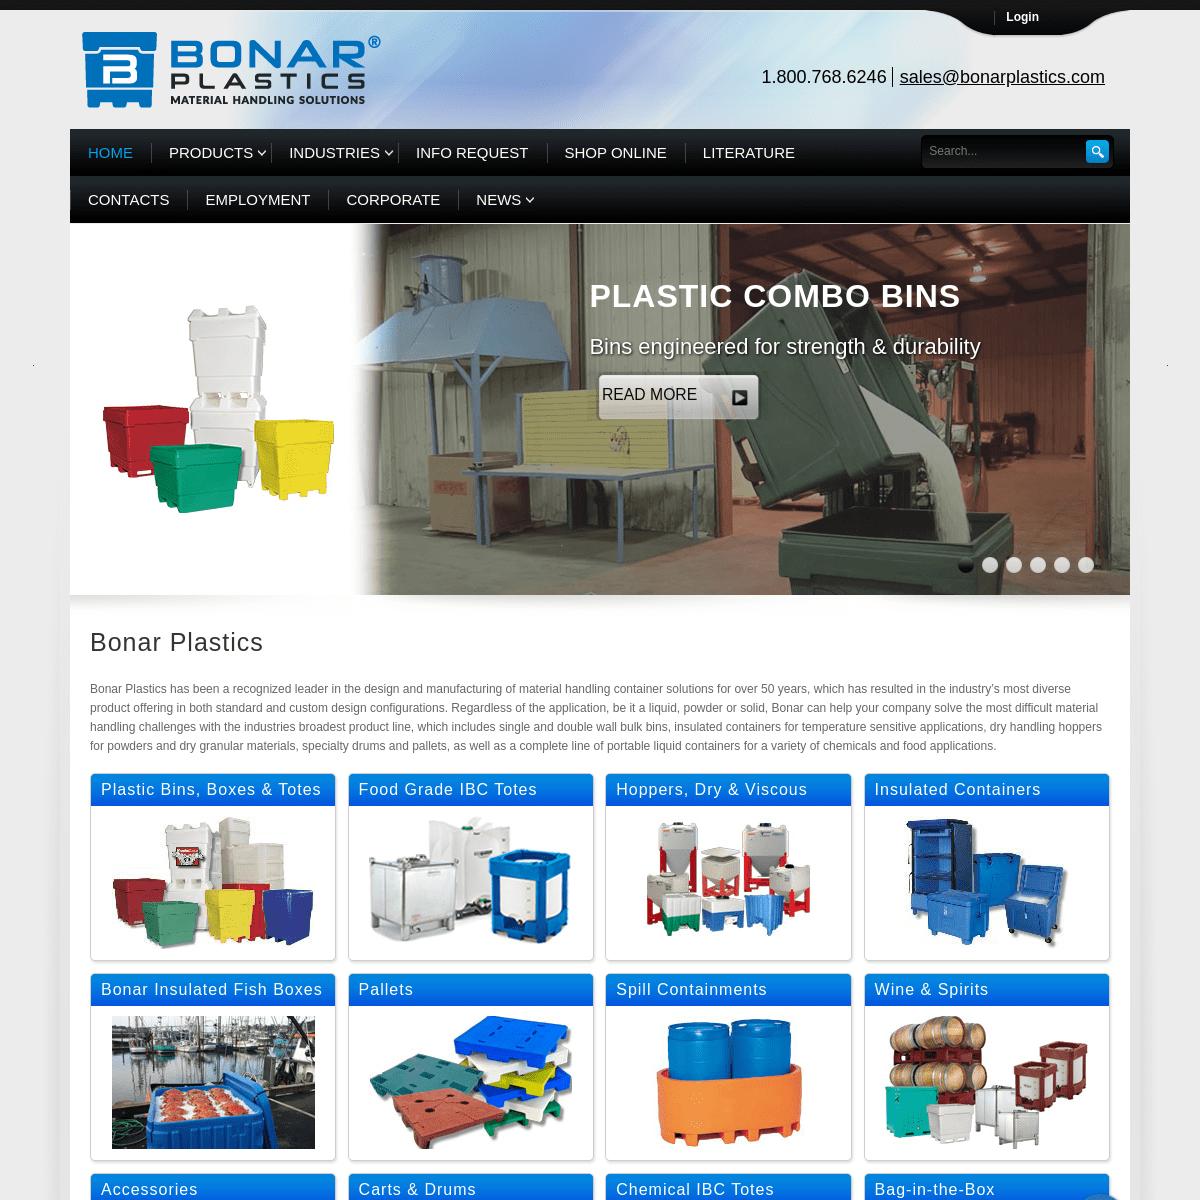 Bonar Plastics - Material Handling Solutions